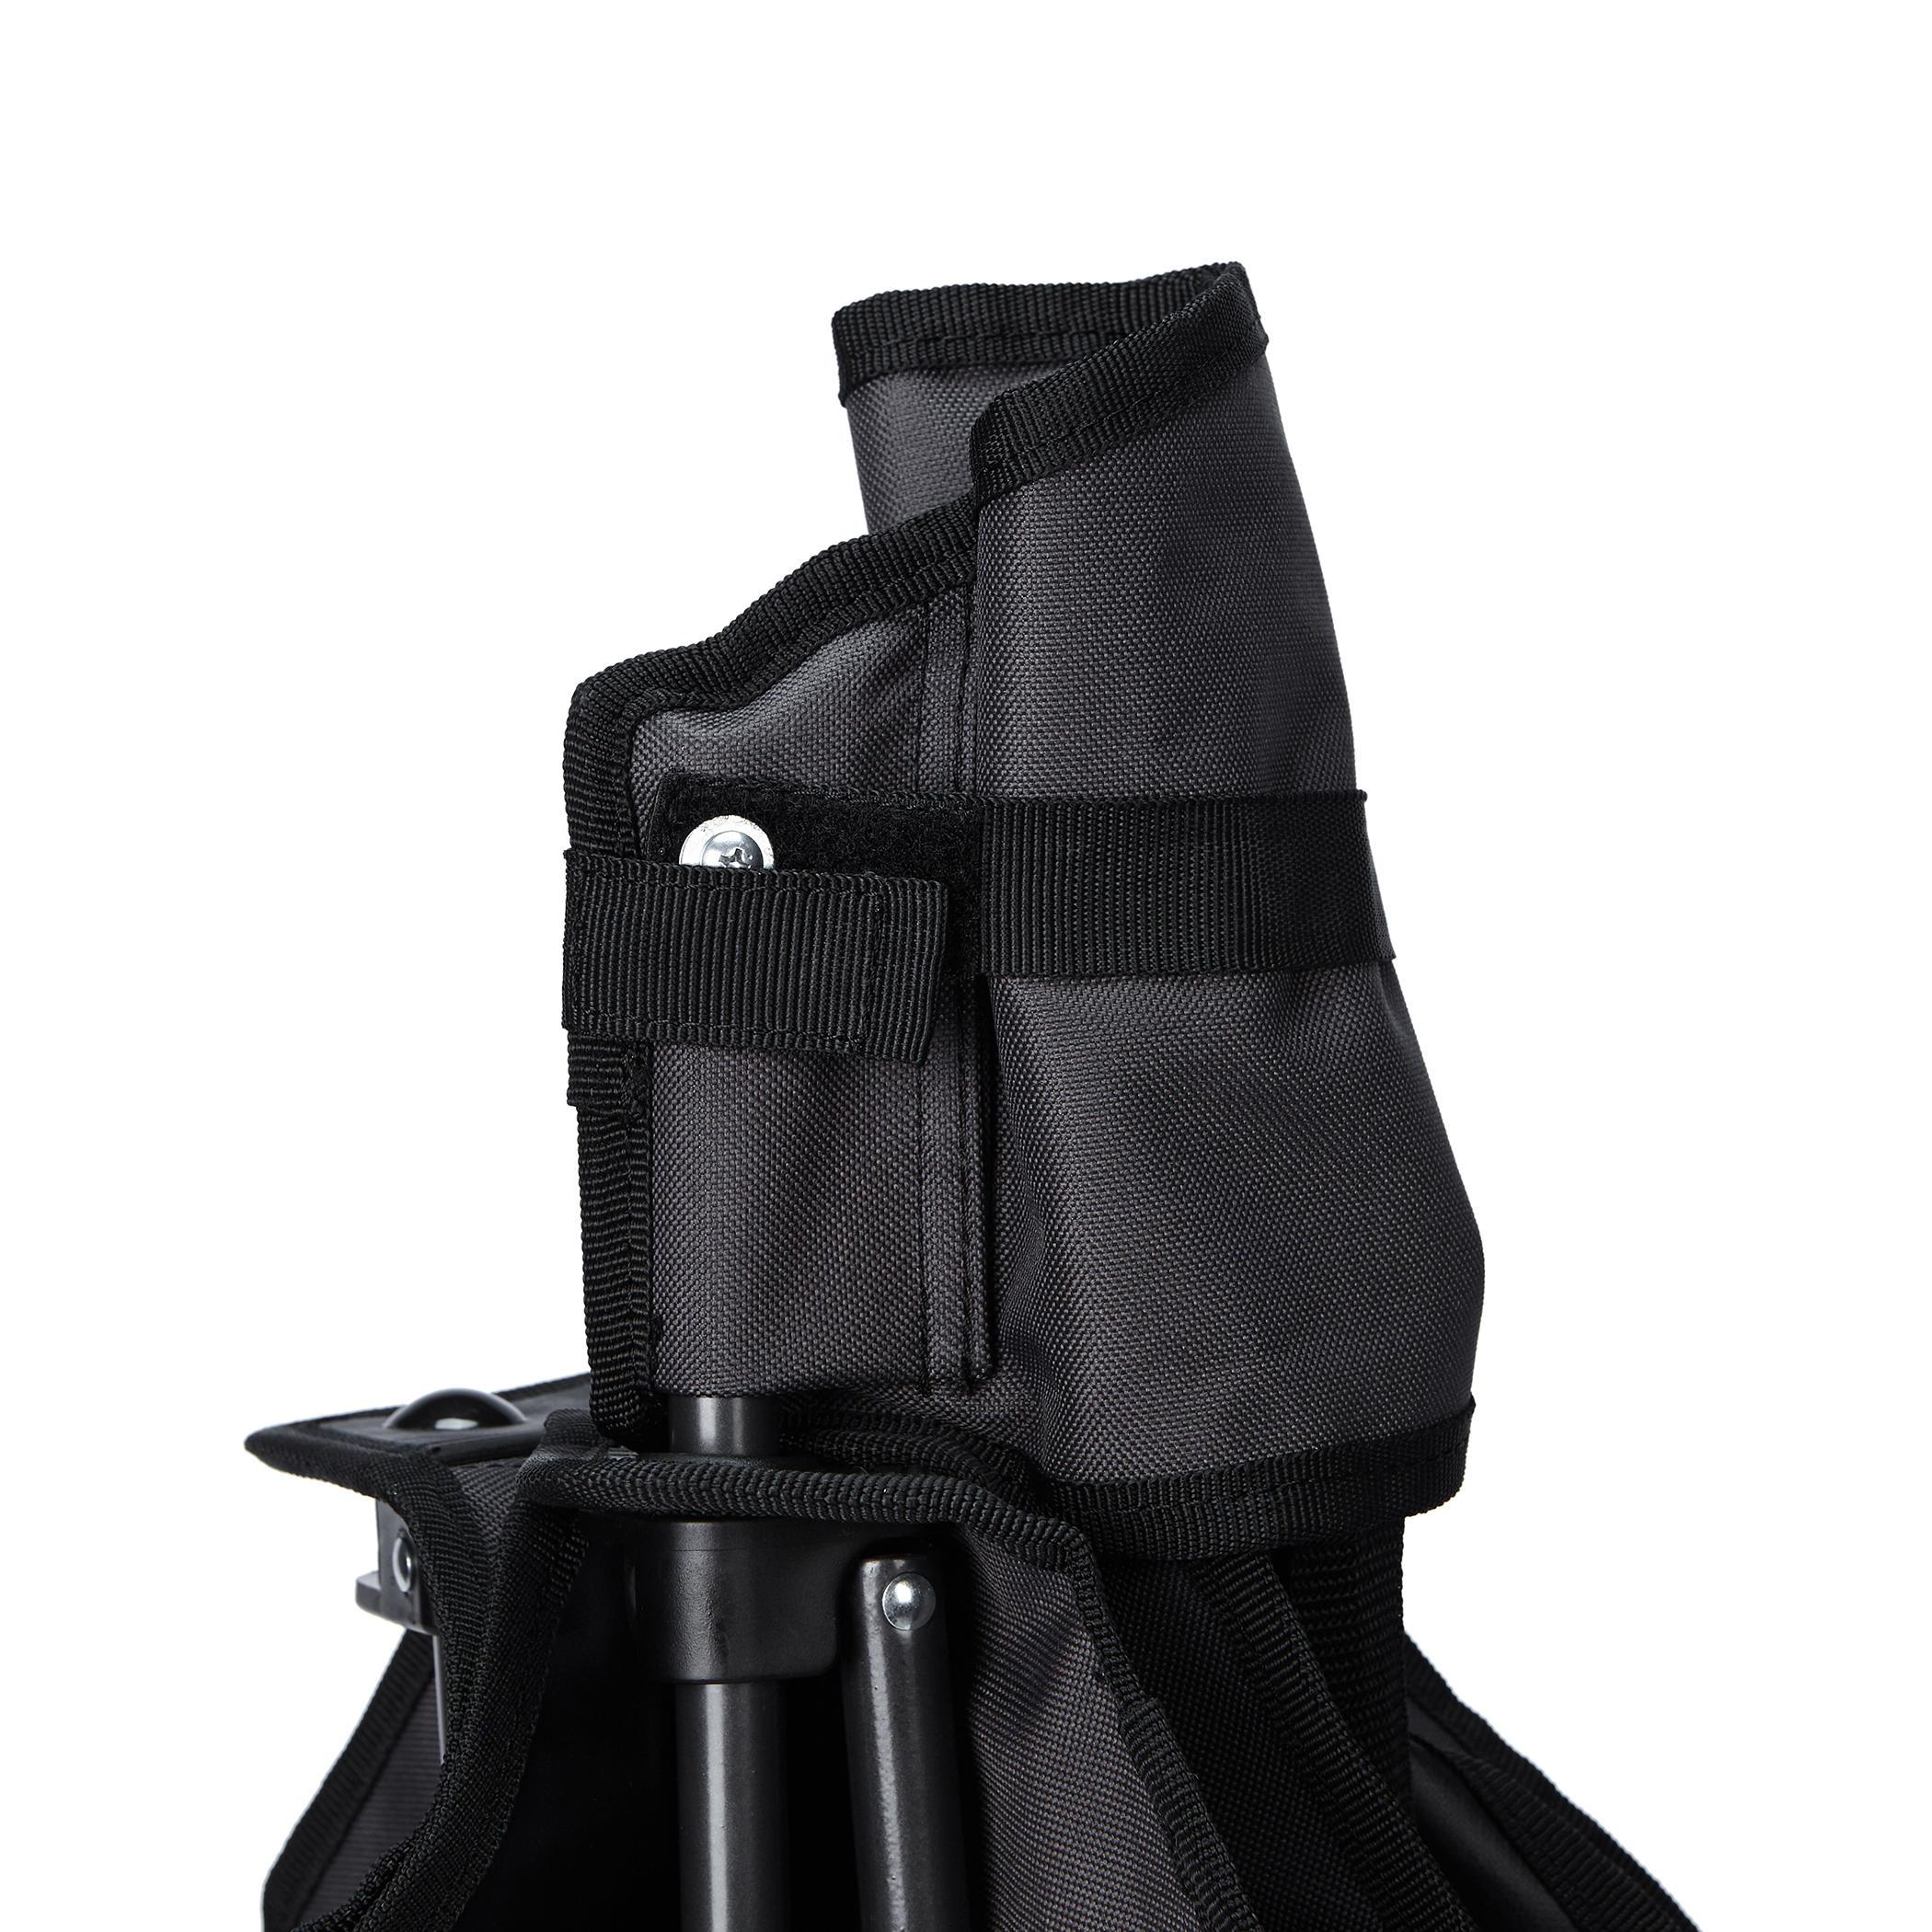 Essenseat Compact Folding Fishing Chair